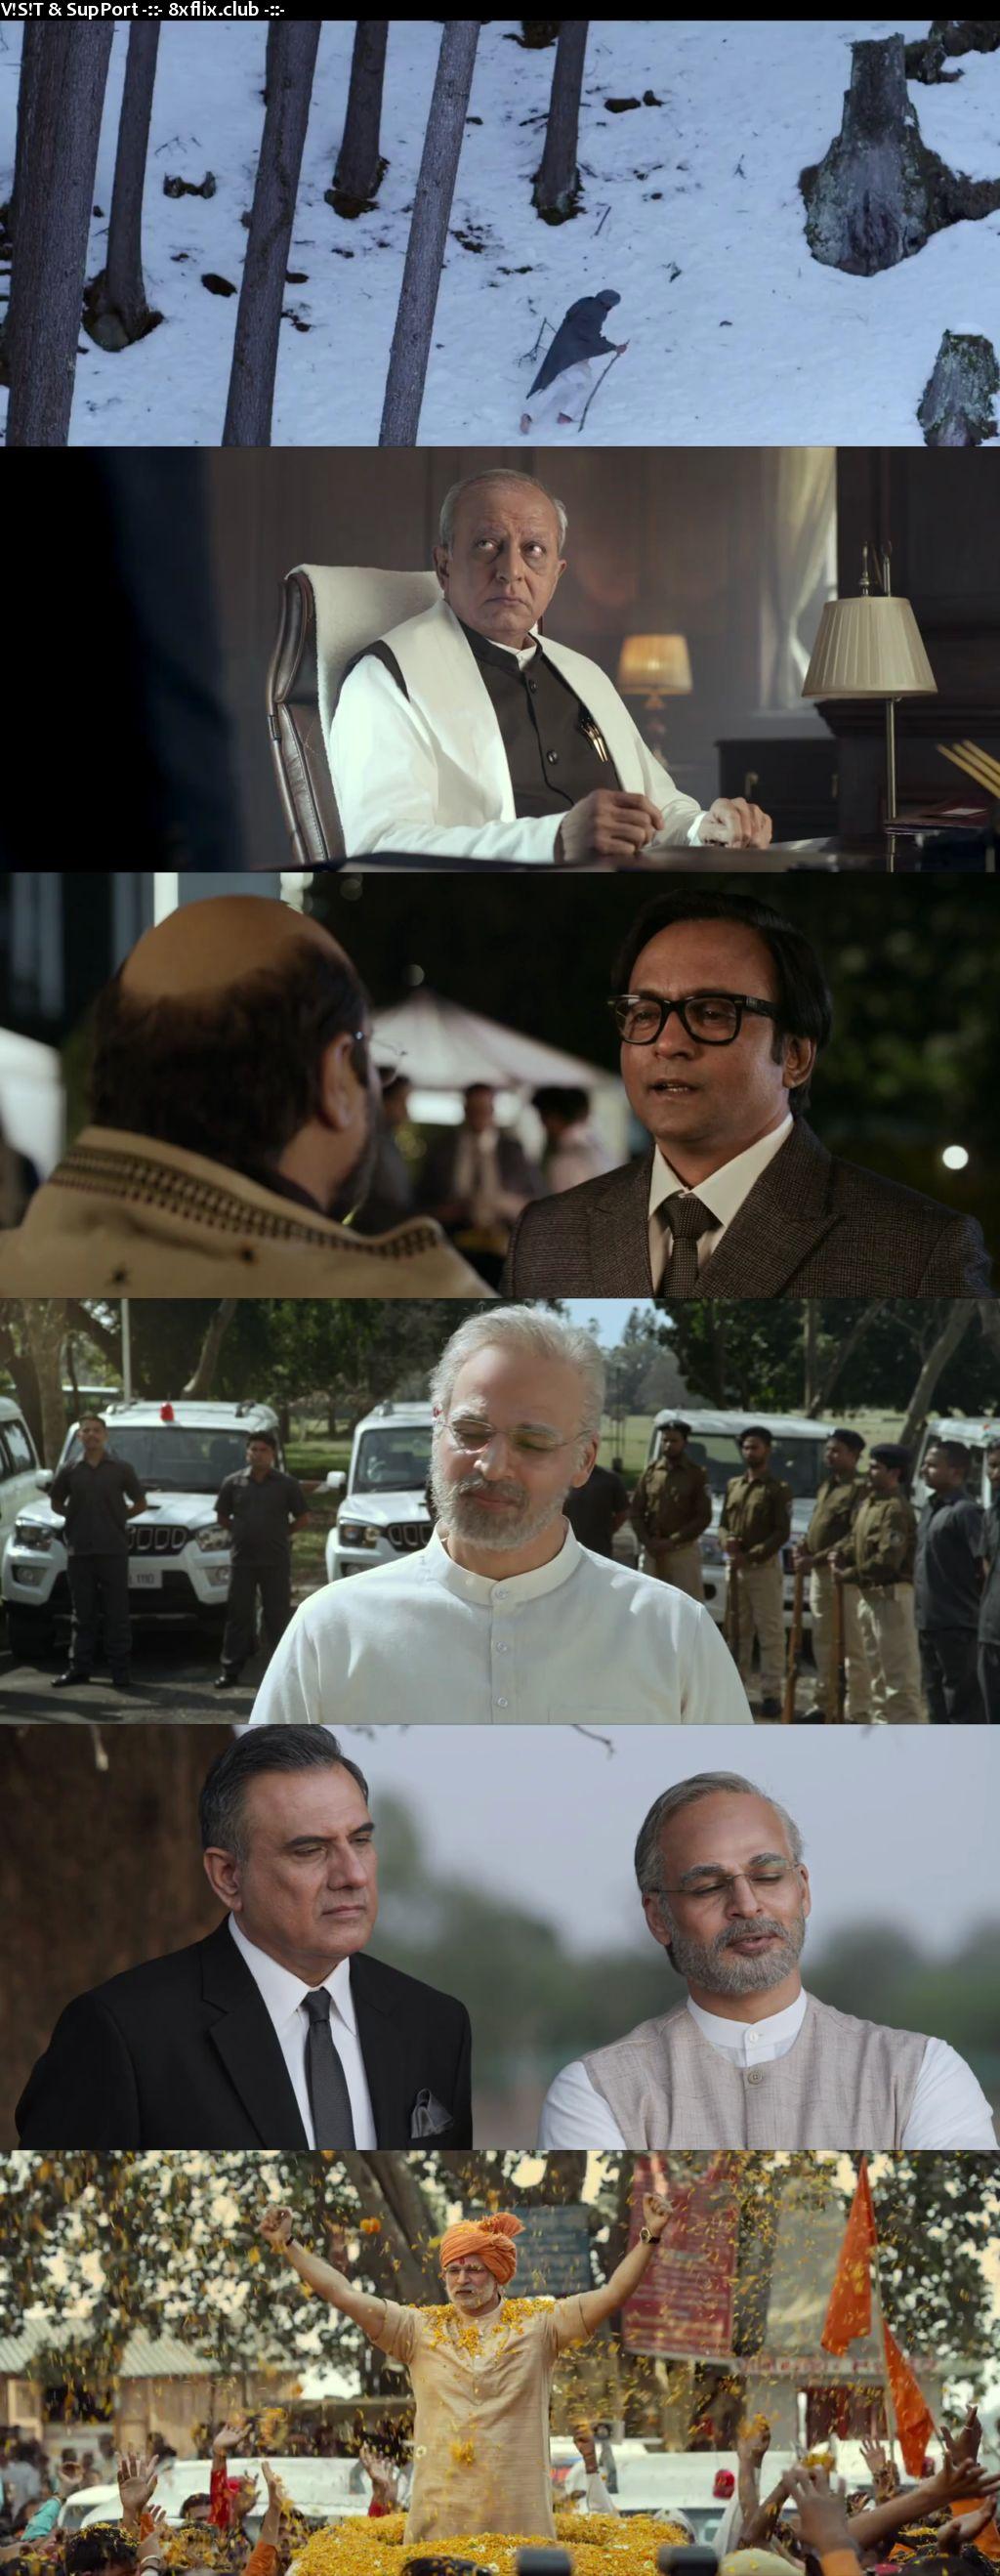 PM Narendra Modi 2019 Full Hindi Movie Download 720p 480p Web-DL HD